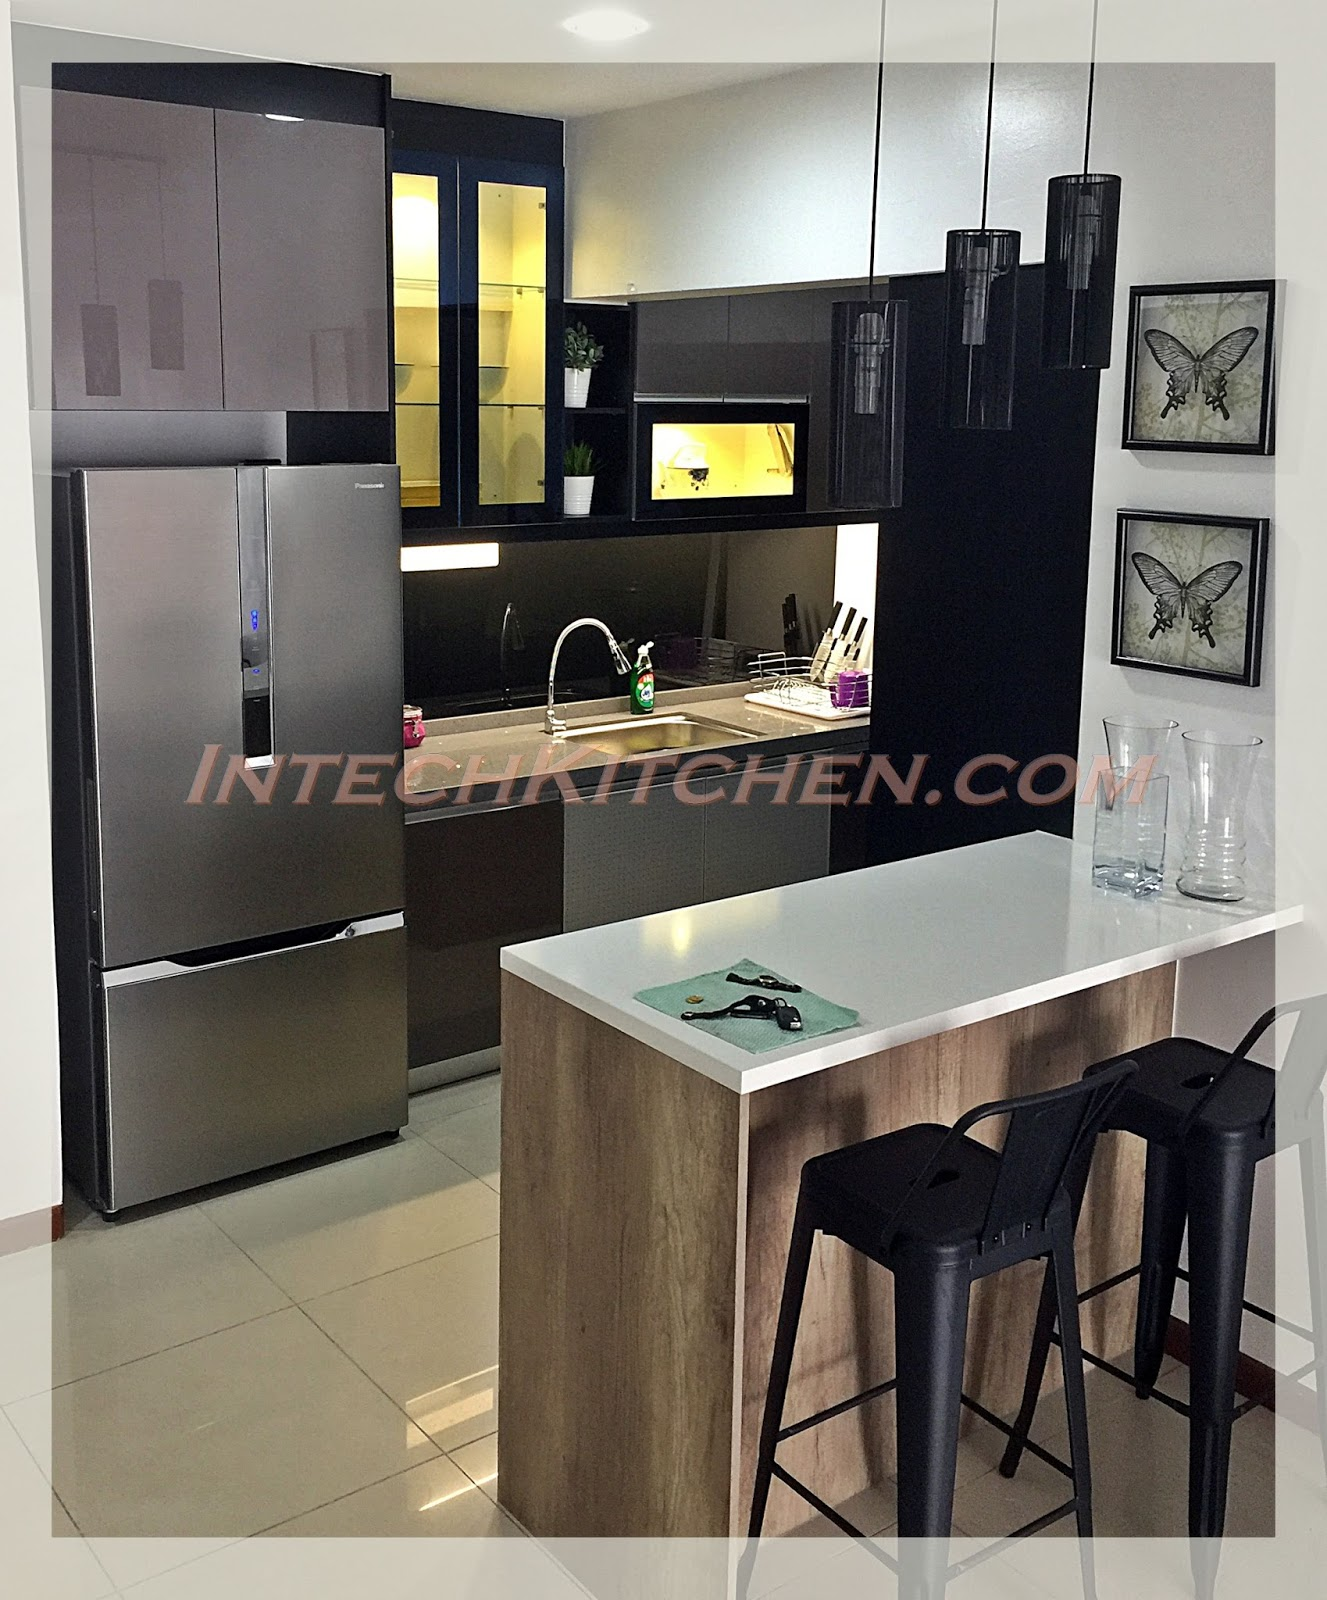 Intech Kitchen Sdn Bhd